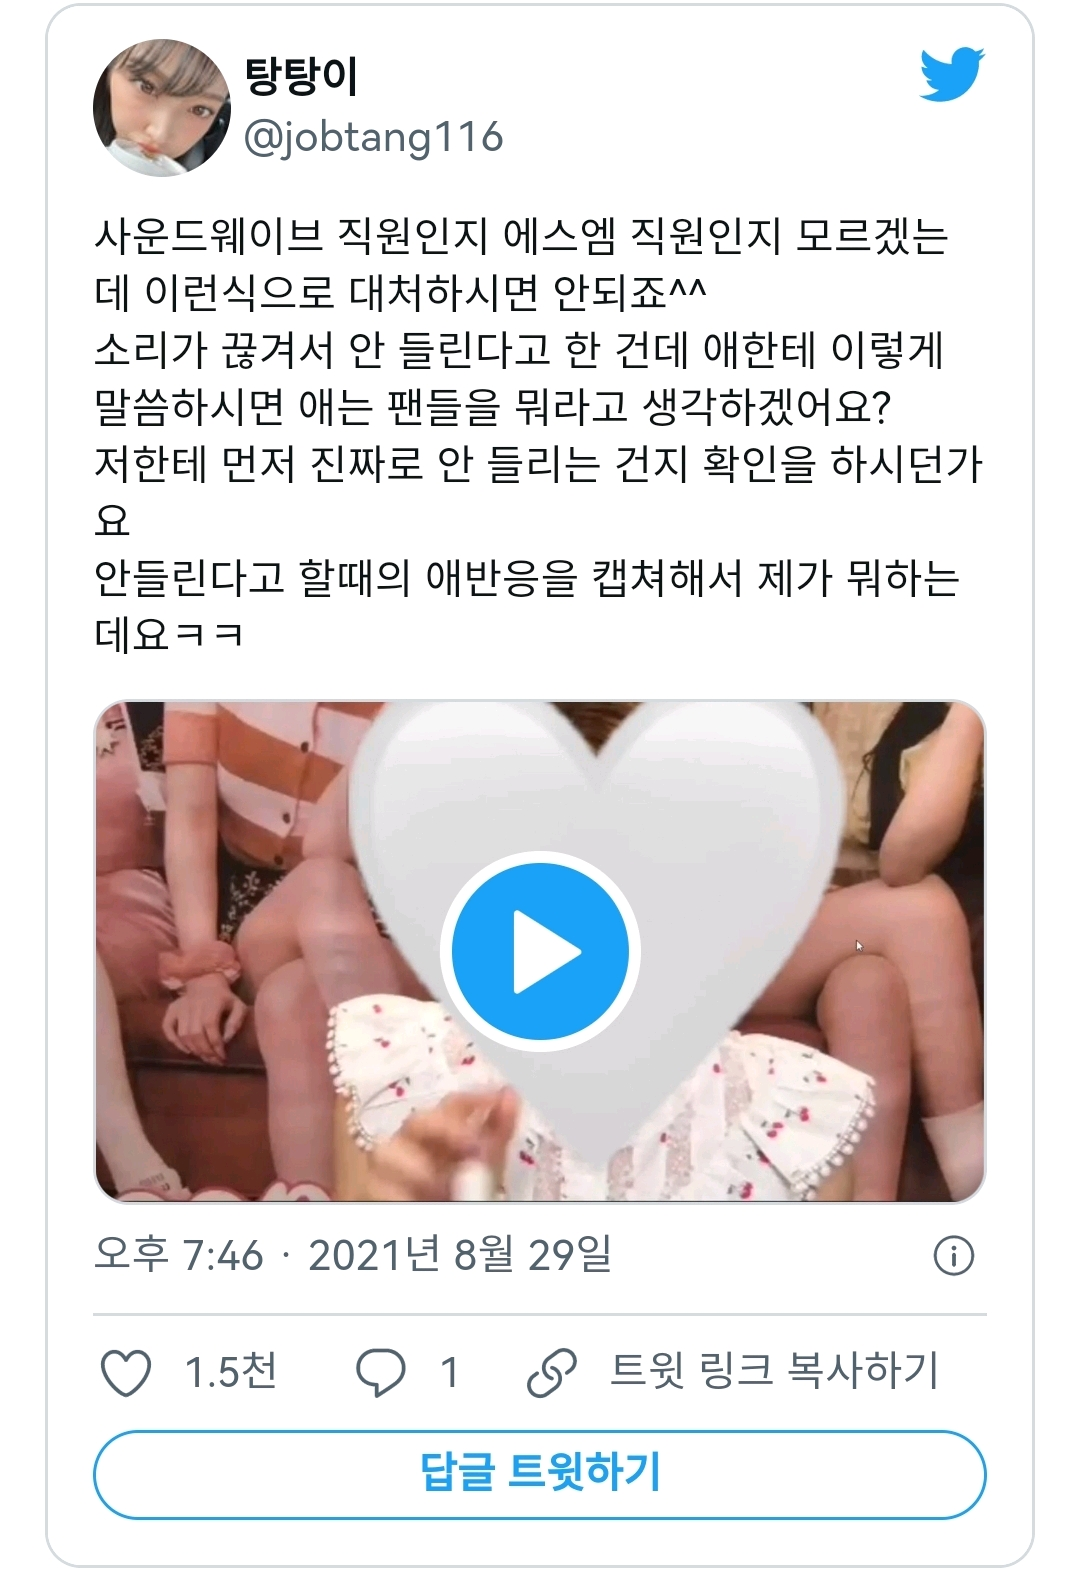 SM最近怎么了?视频签售会男工作人员居然在女爱豆面前说粉丝闲话